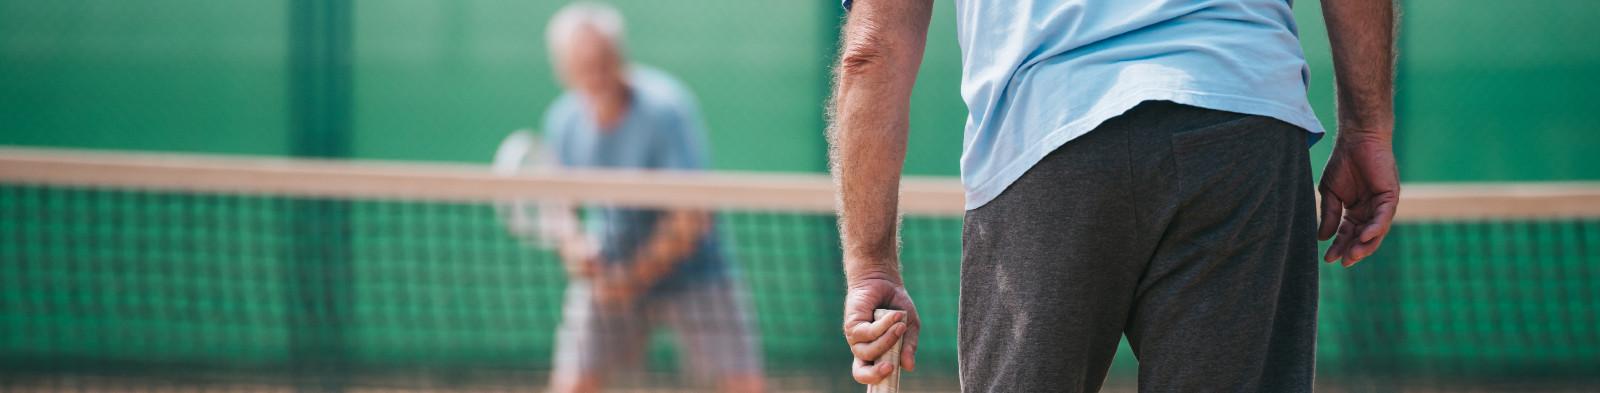 Elderly gentlemen playing tennis